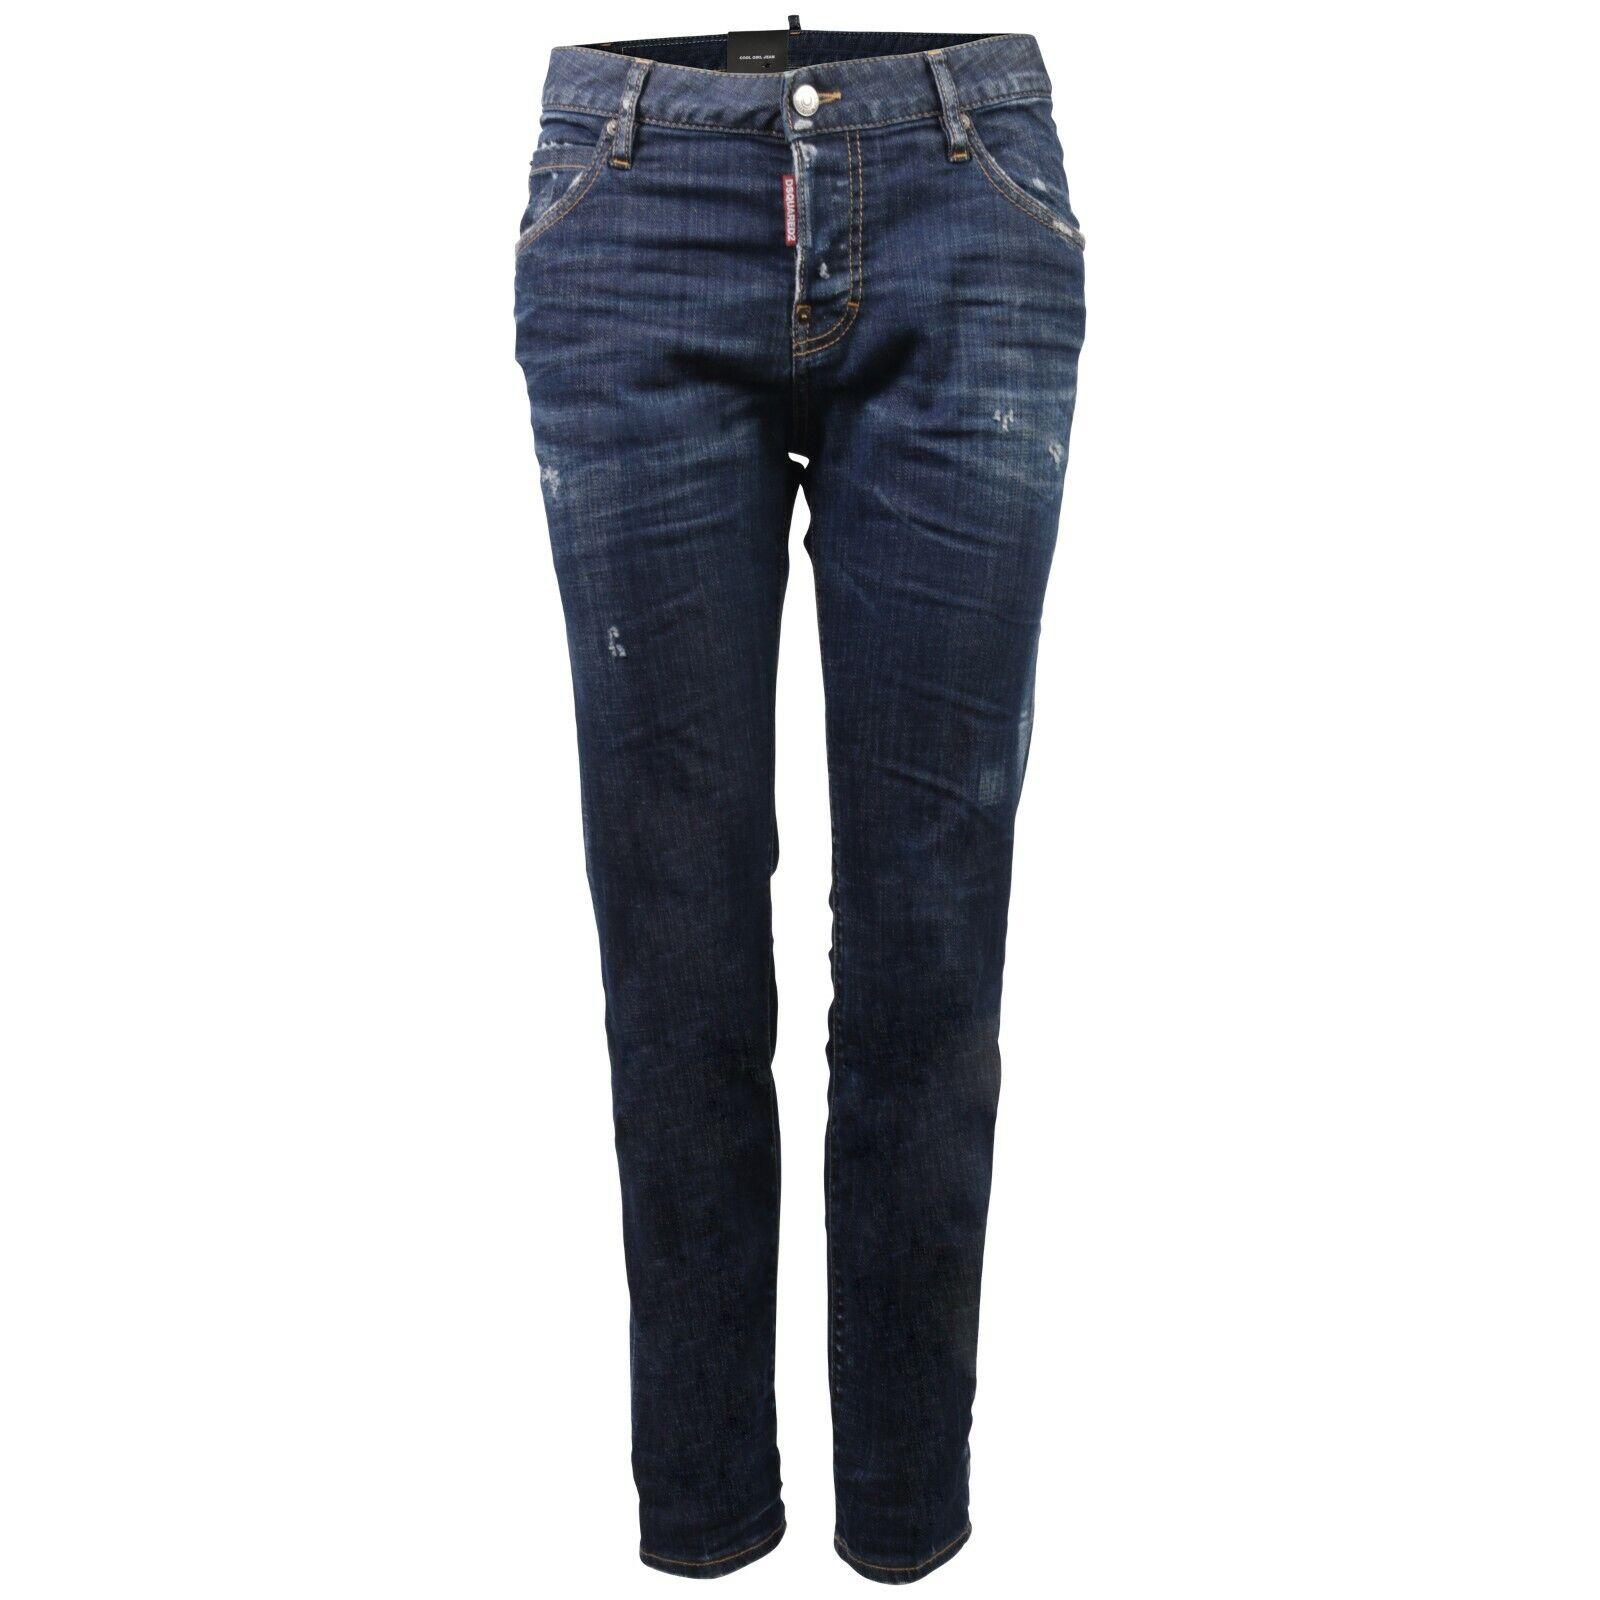 Woherren Dsquarot D2 Cool Girl Jeans blau DENIM GR IT 36 D 30  70940